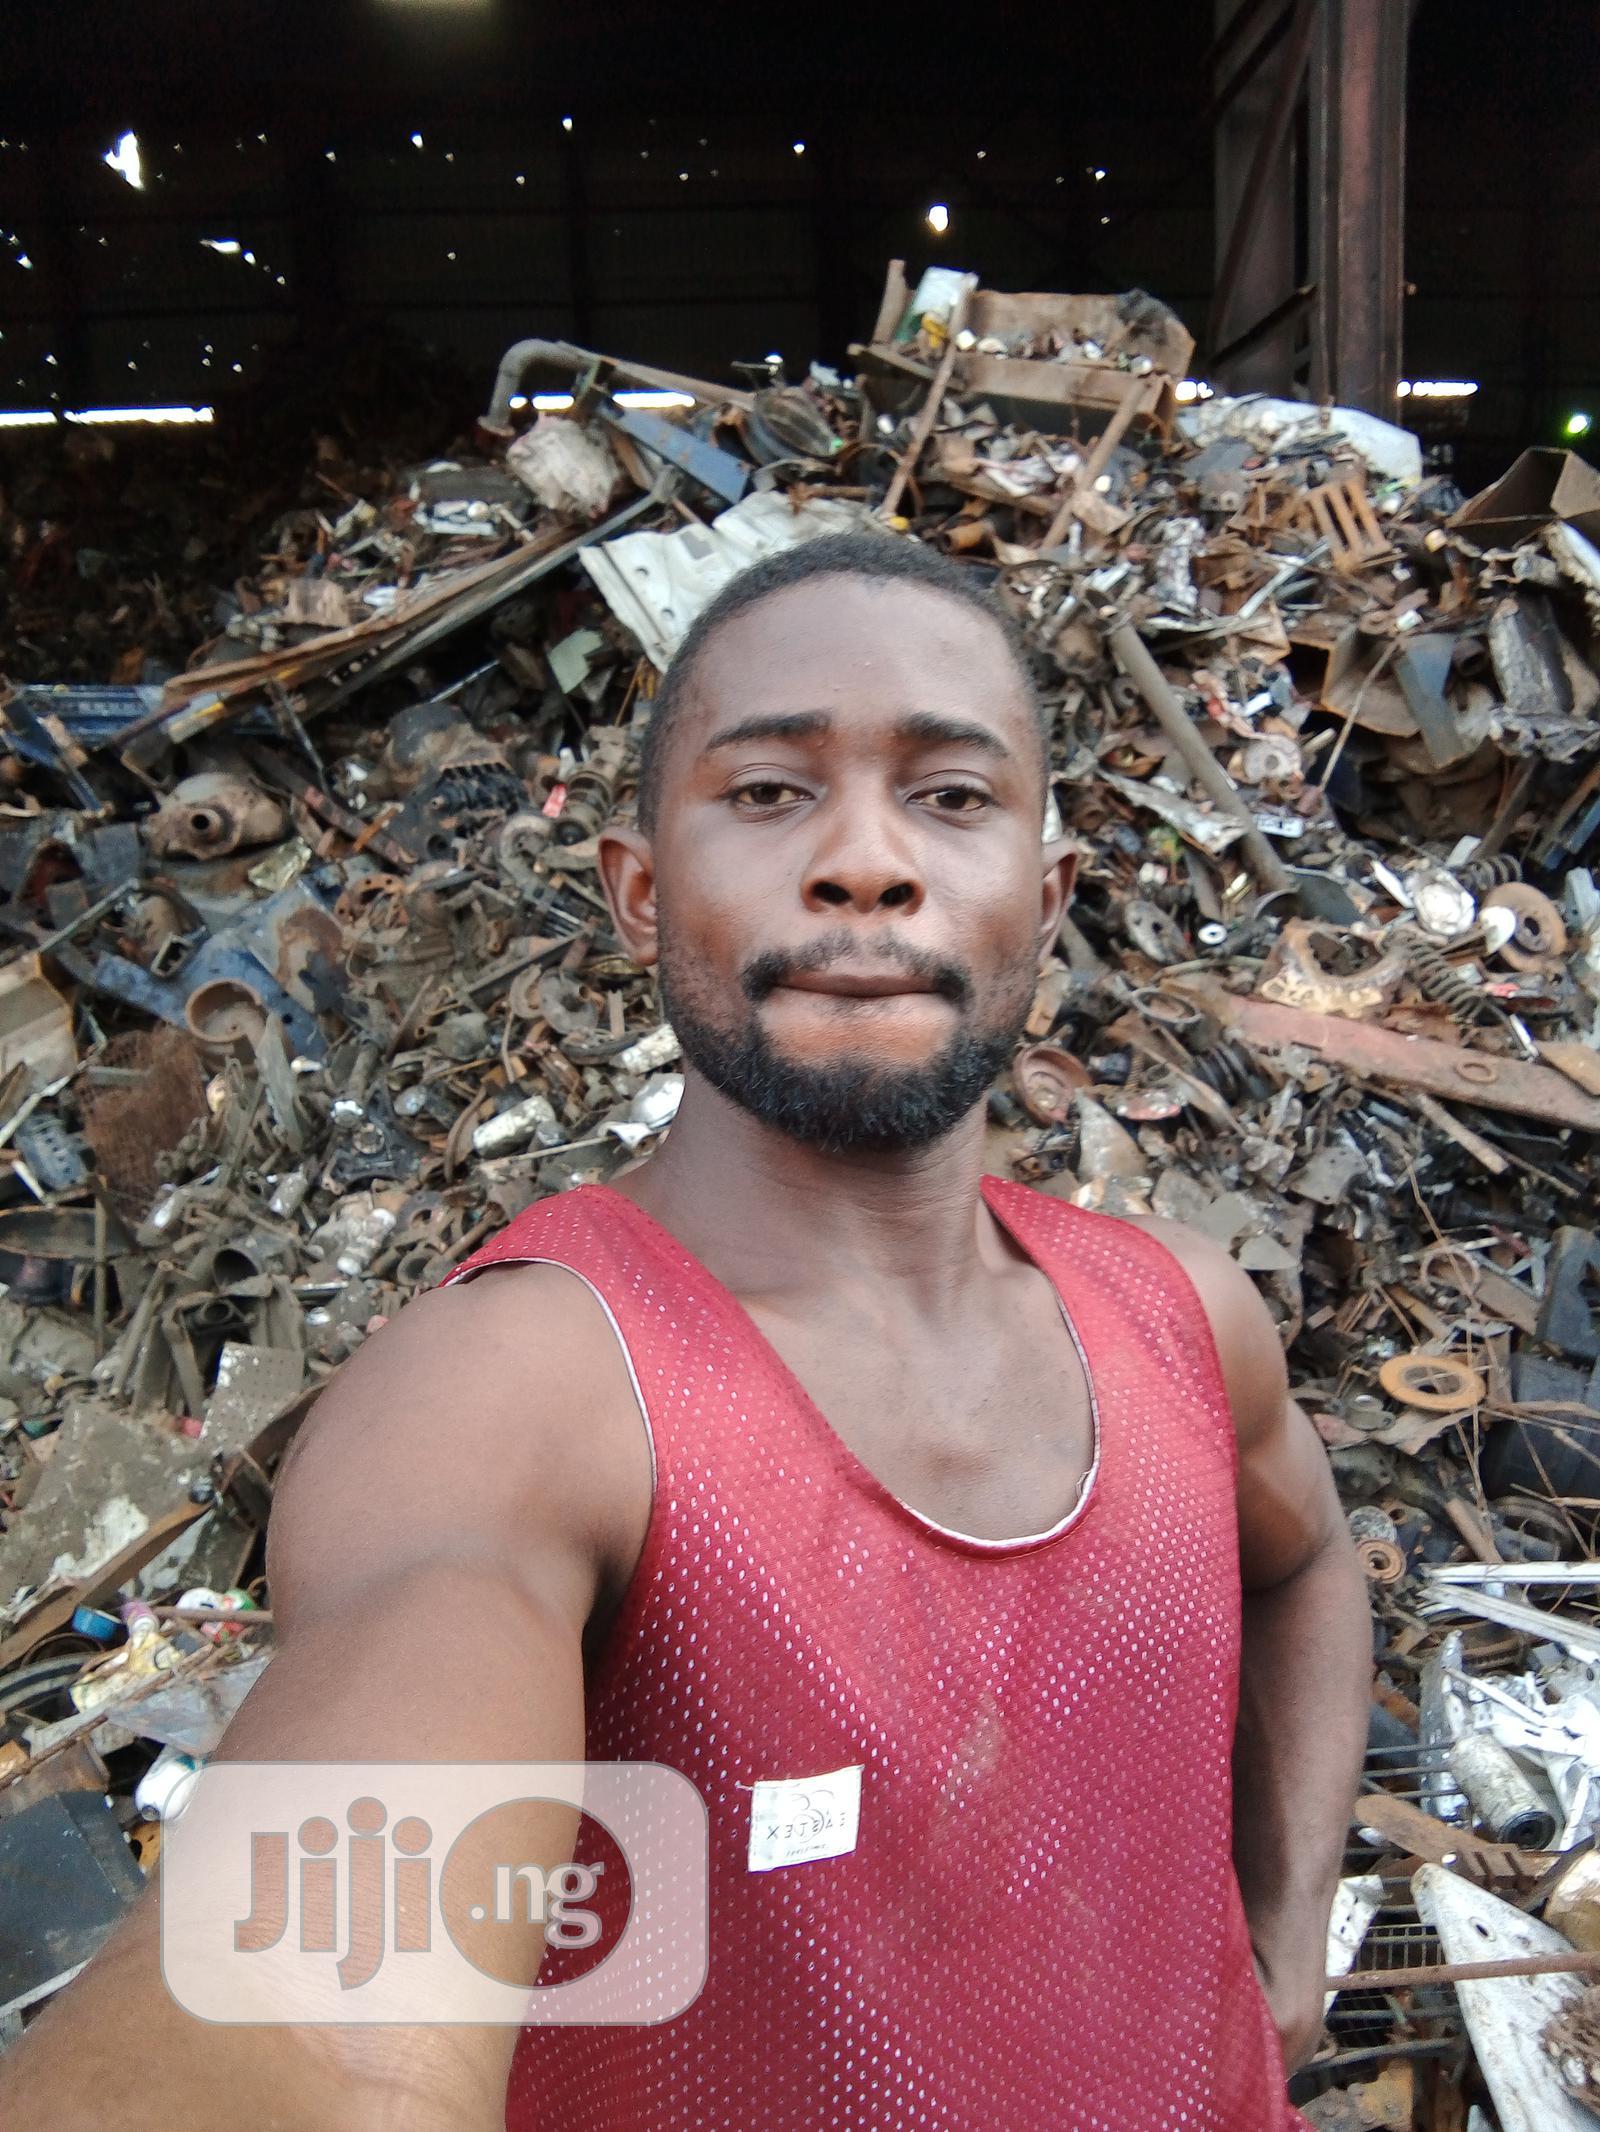 Truck Driver | Driver CVs for sale in Gwer, Benue State, Nigeria